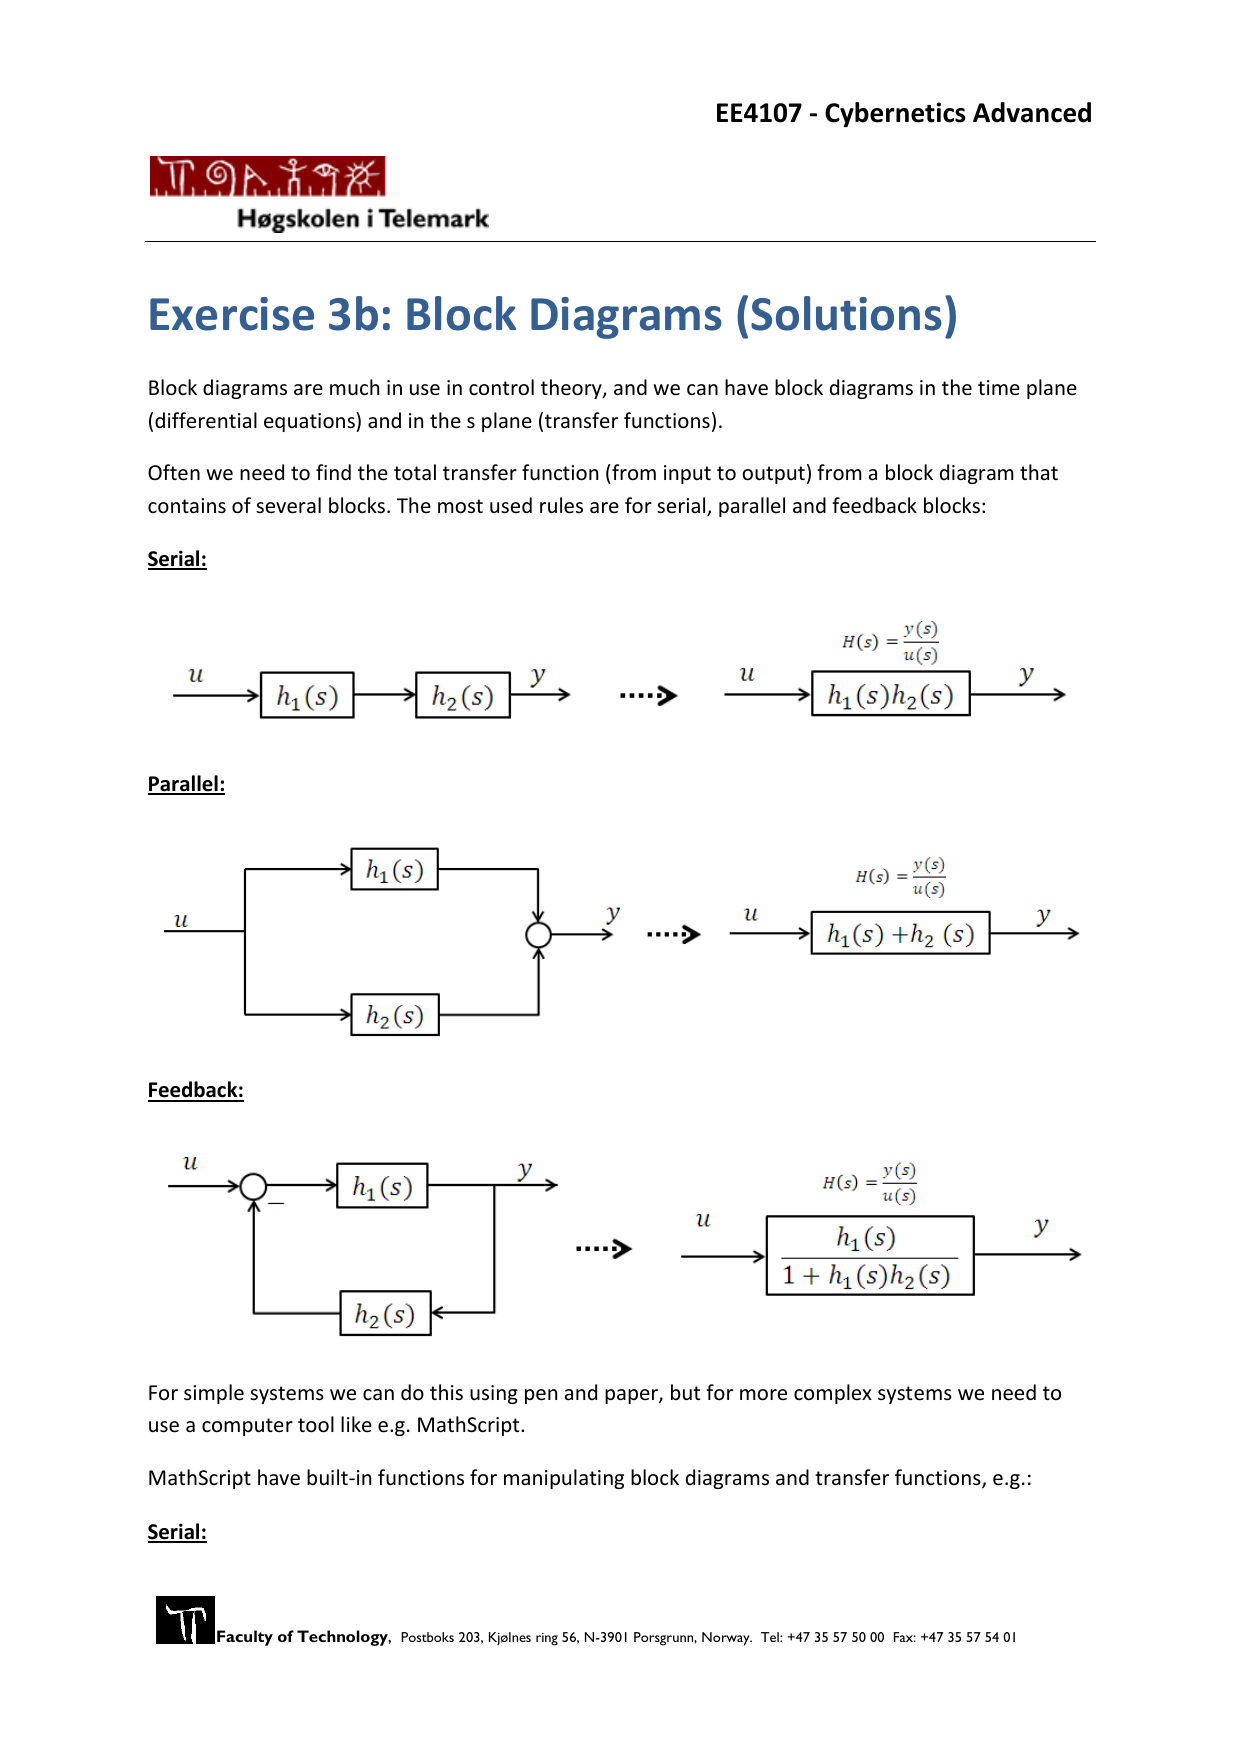 Exercise 3b: Block Diagrams (Solutions)Studylib